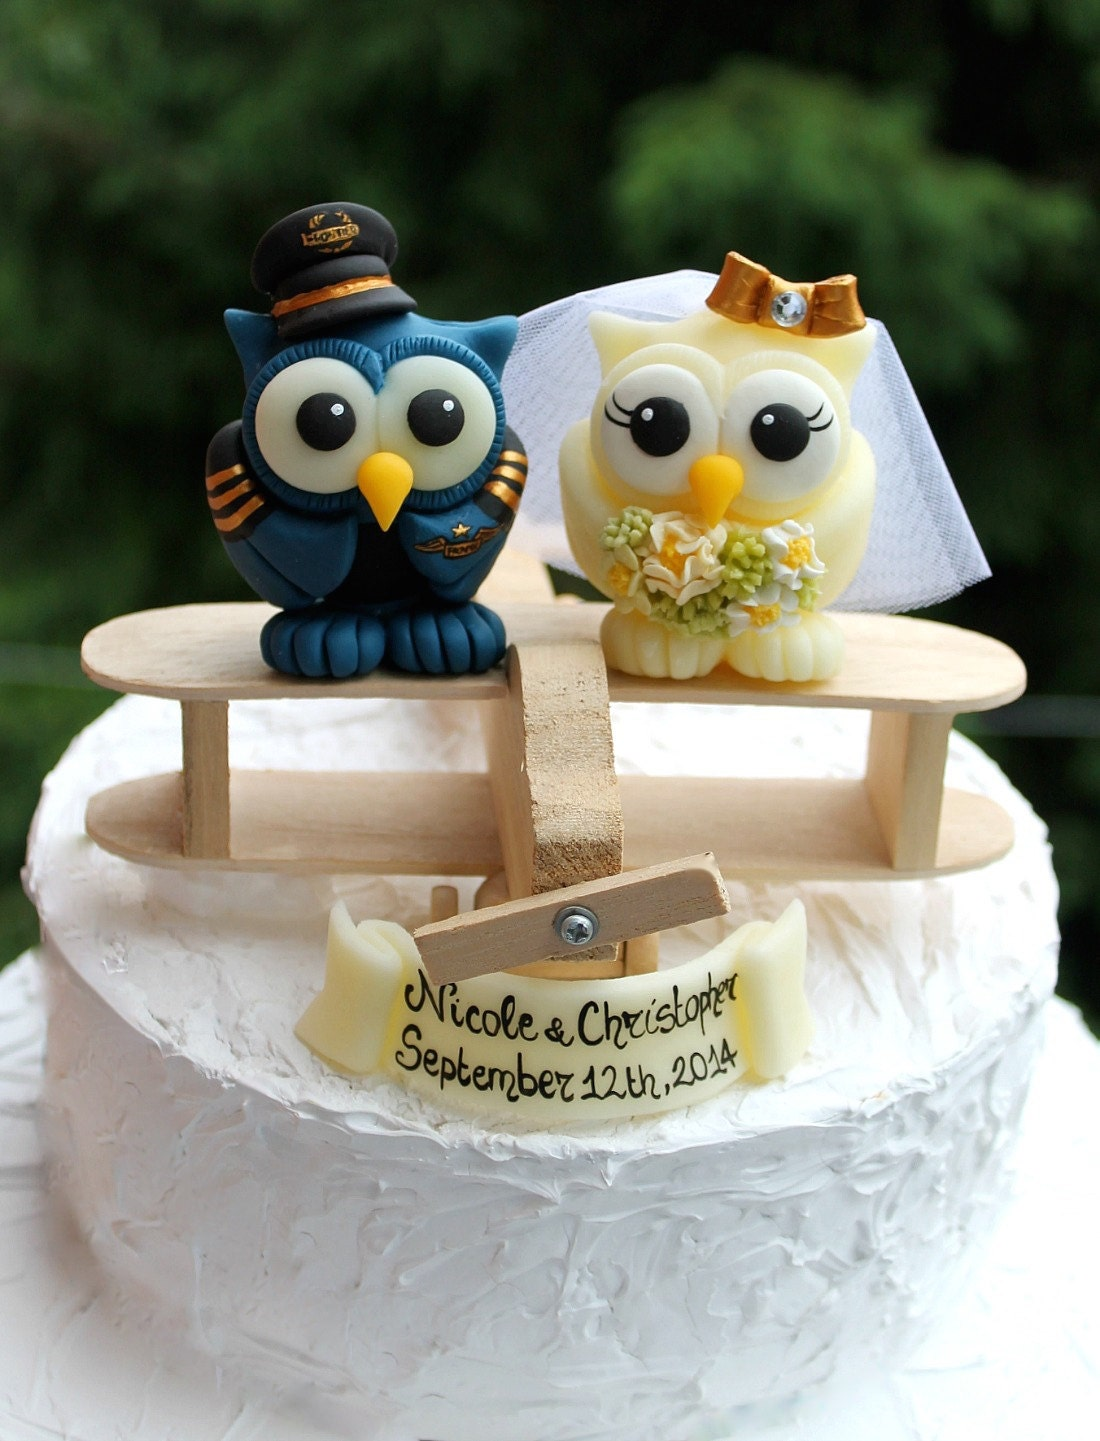 Plane Wedding Cake Topper Owls Love Birds Bride And Groom